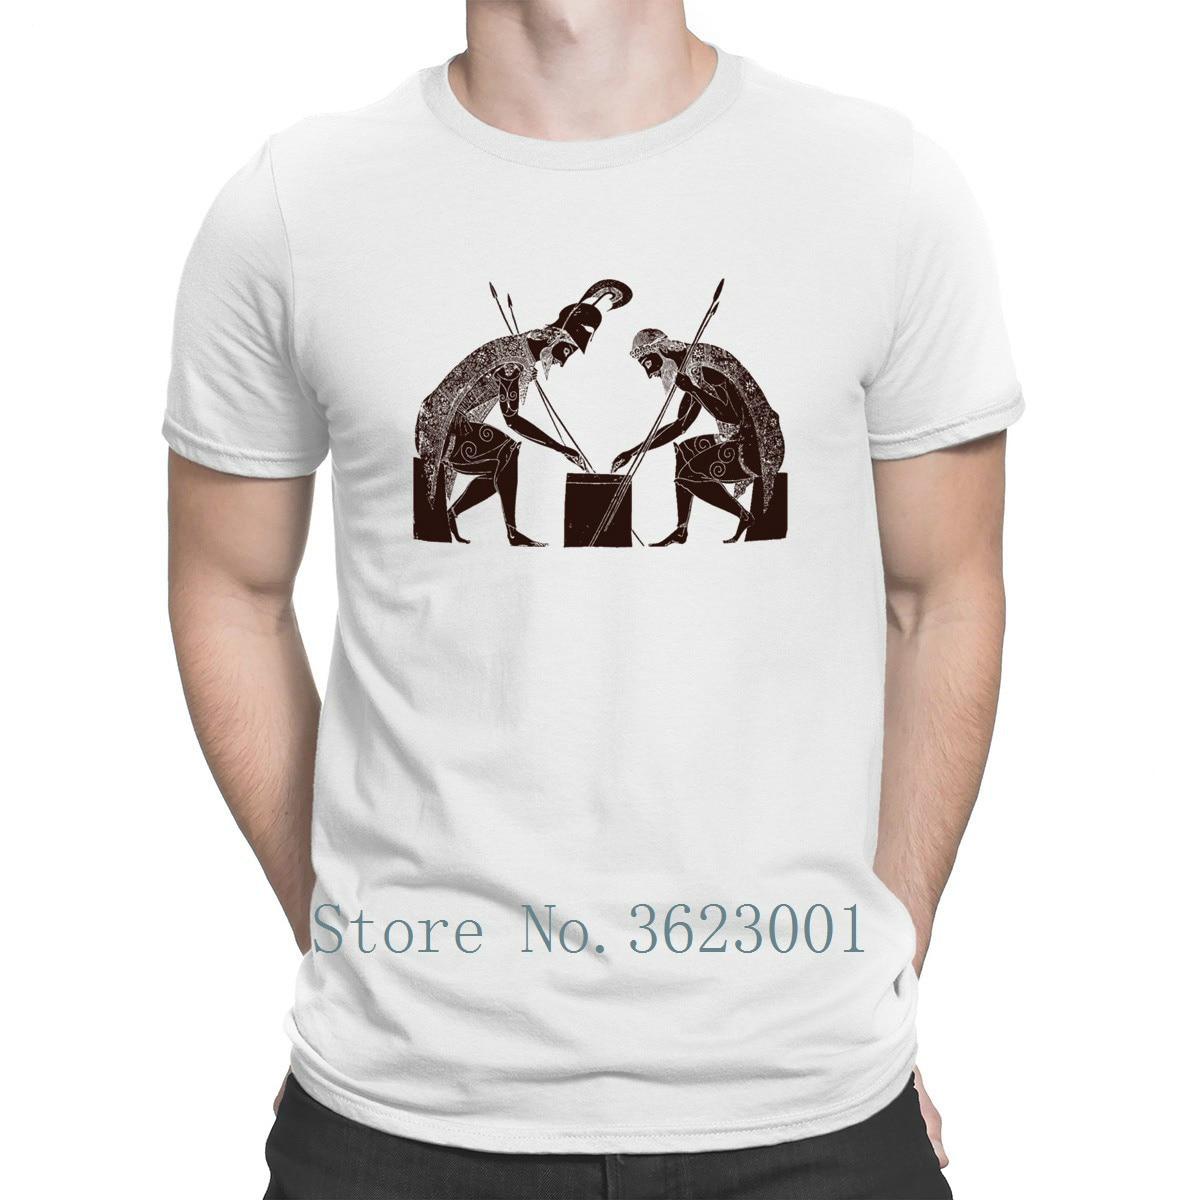 Camiseta Formal con estampado para caballero Aquiles Ajaxs, camiseta de ajedrez para hombre, la mejor camiseta peculiar, Camiseta de cuello redondo, camiseta Top